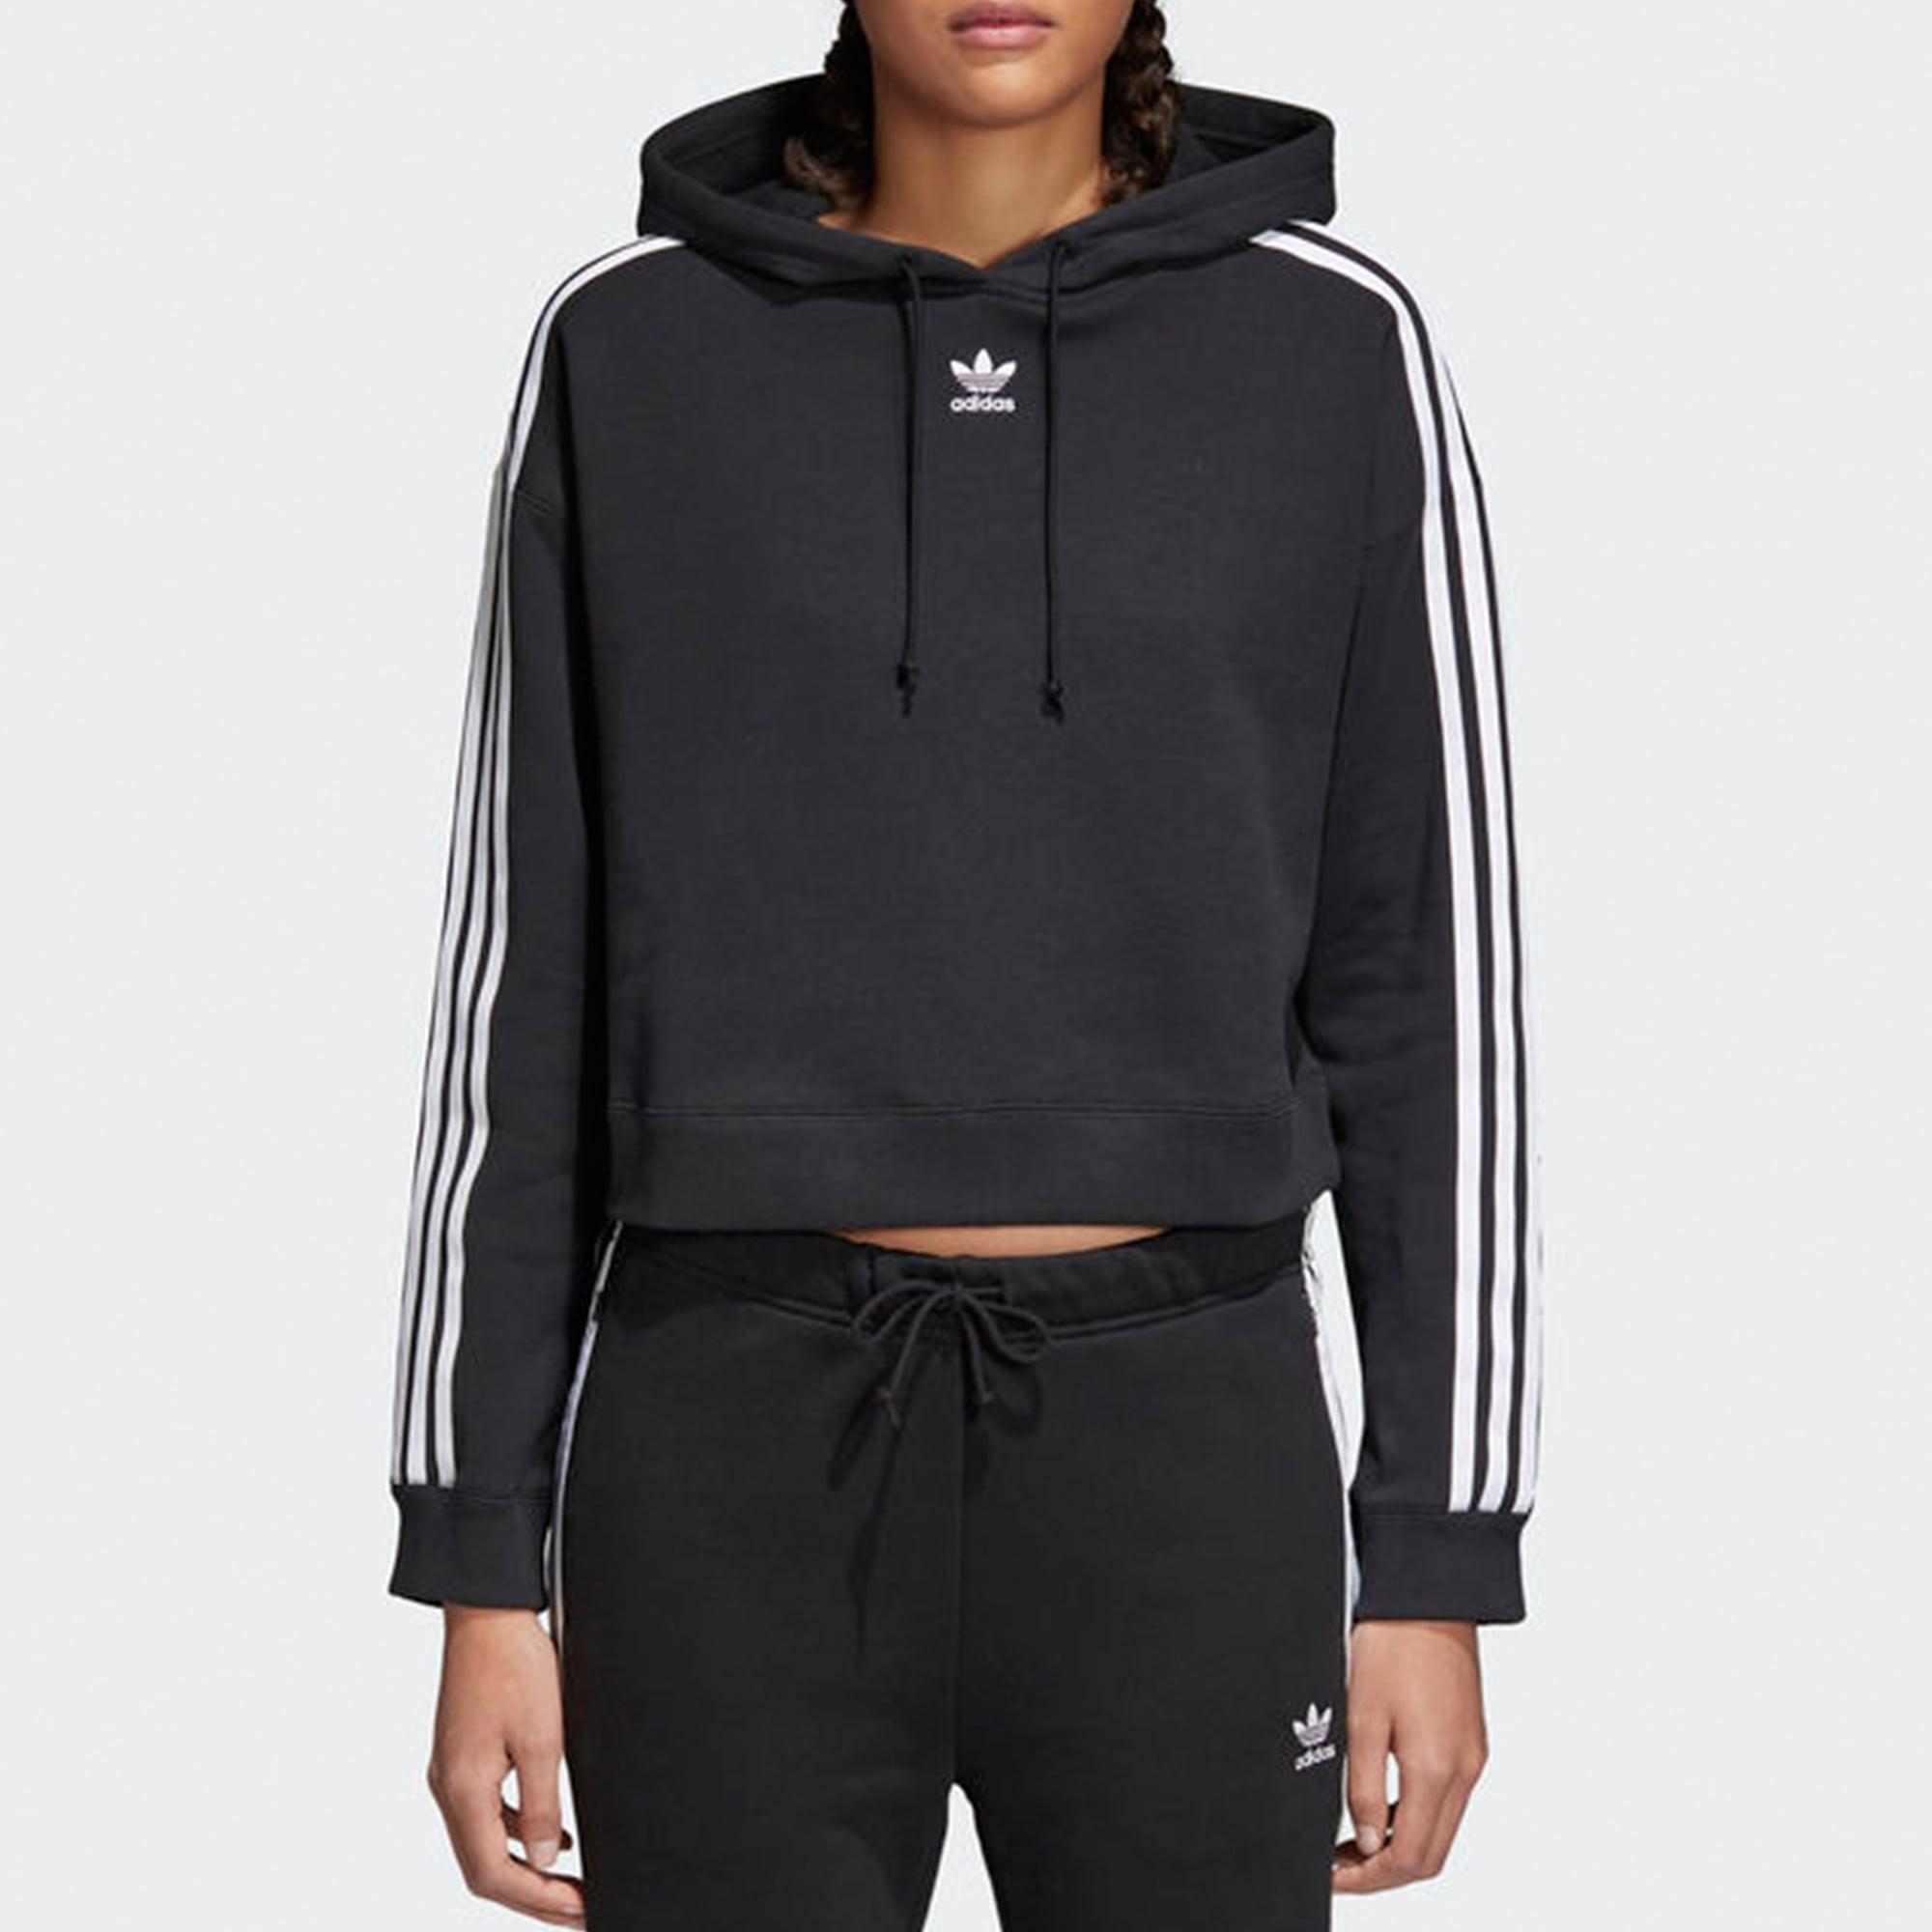 new styles dirt cheap amazing price adidas Originals Womens Womens Cropped Hoodie